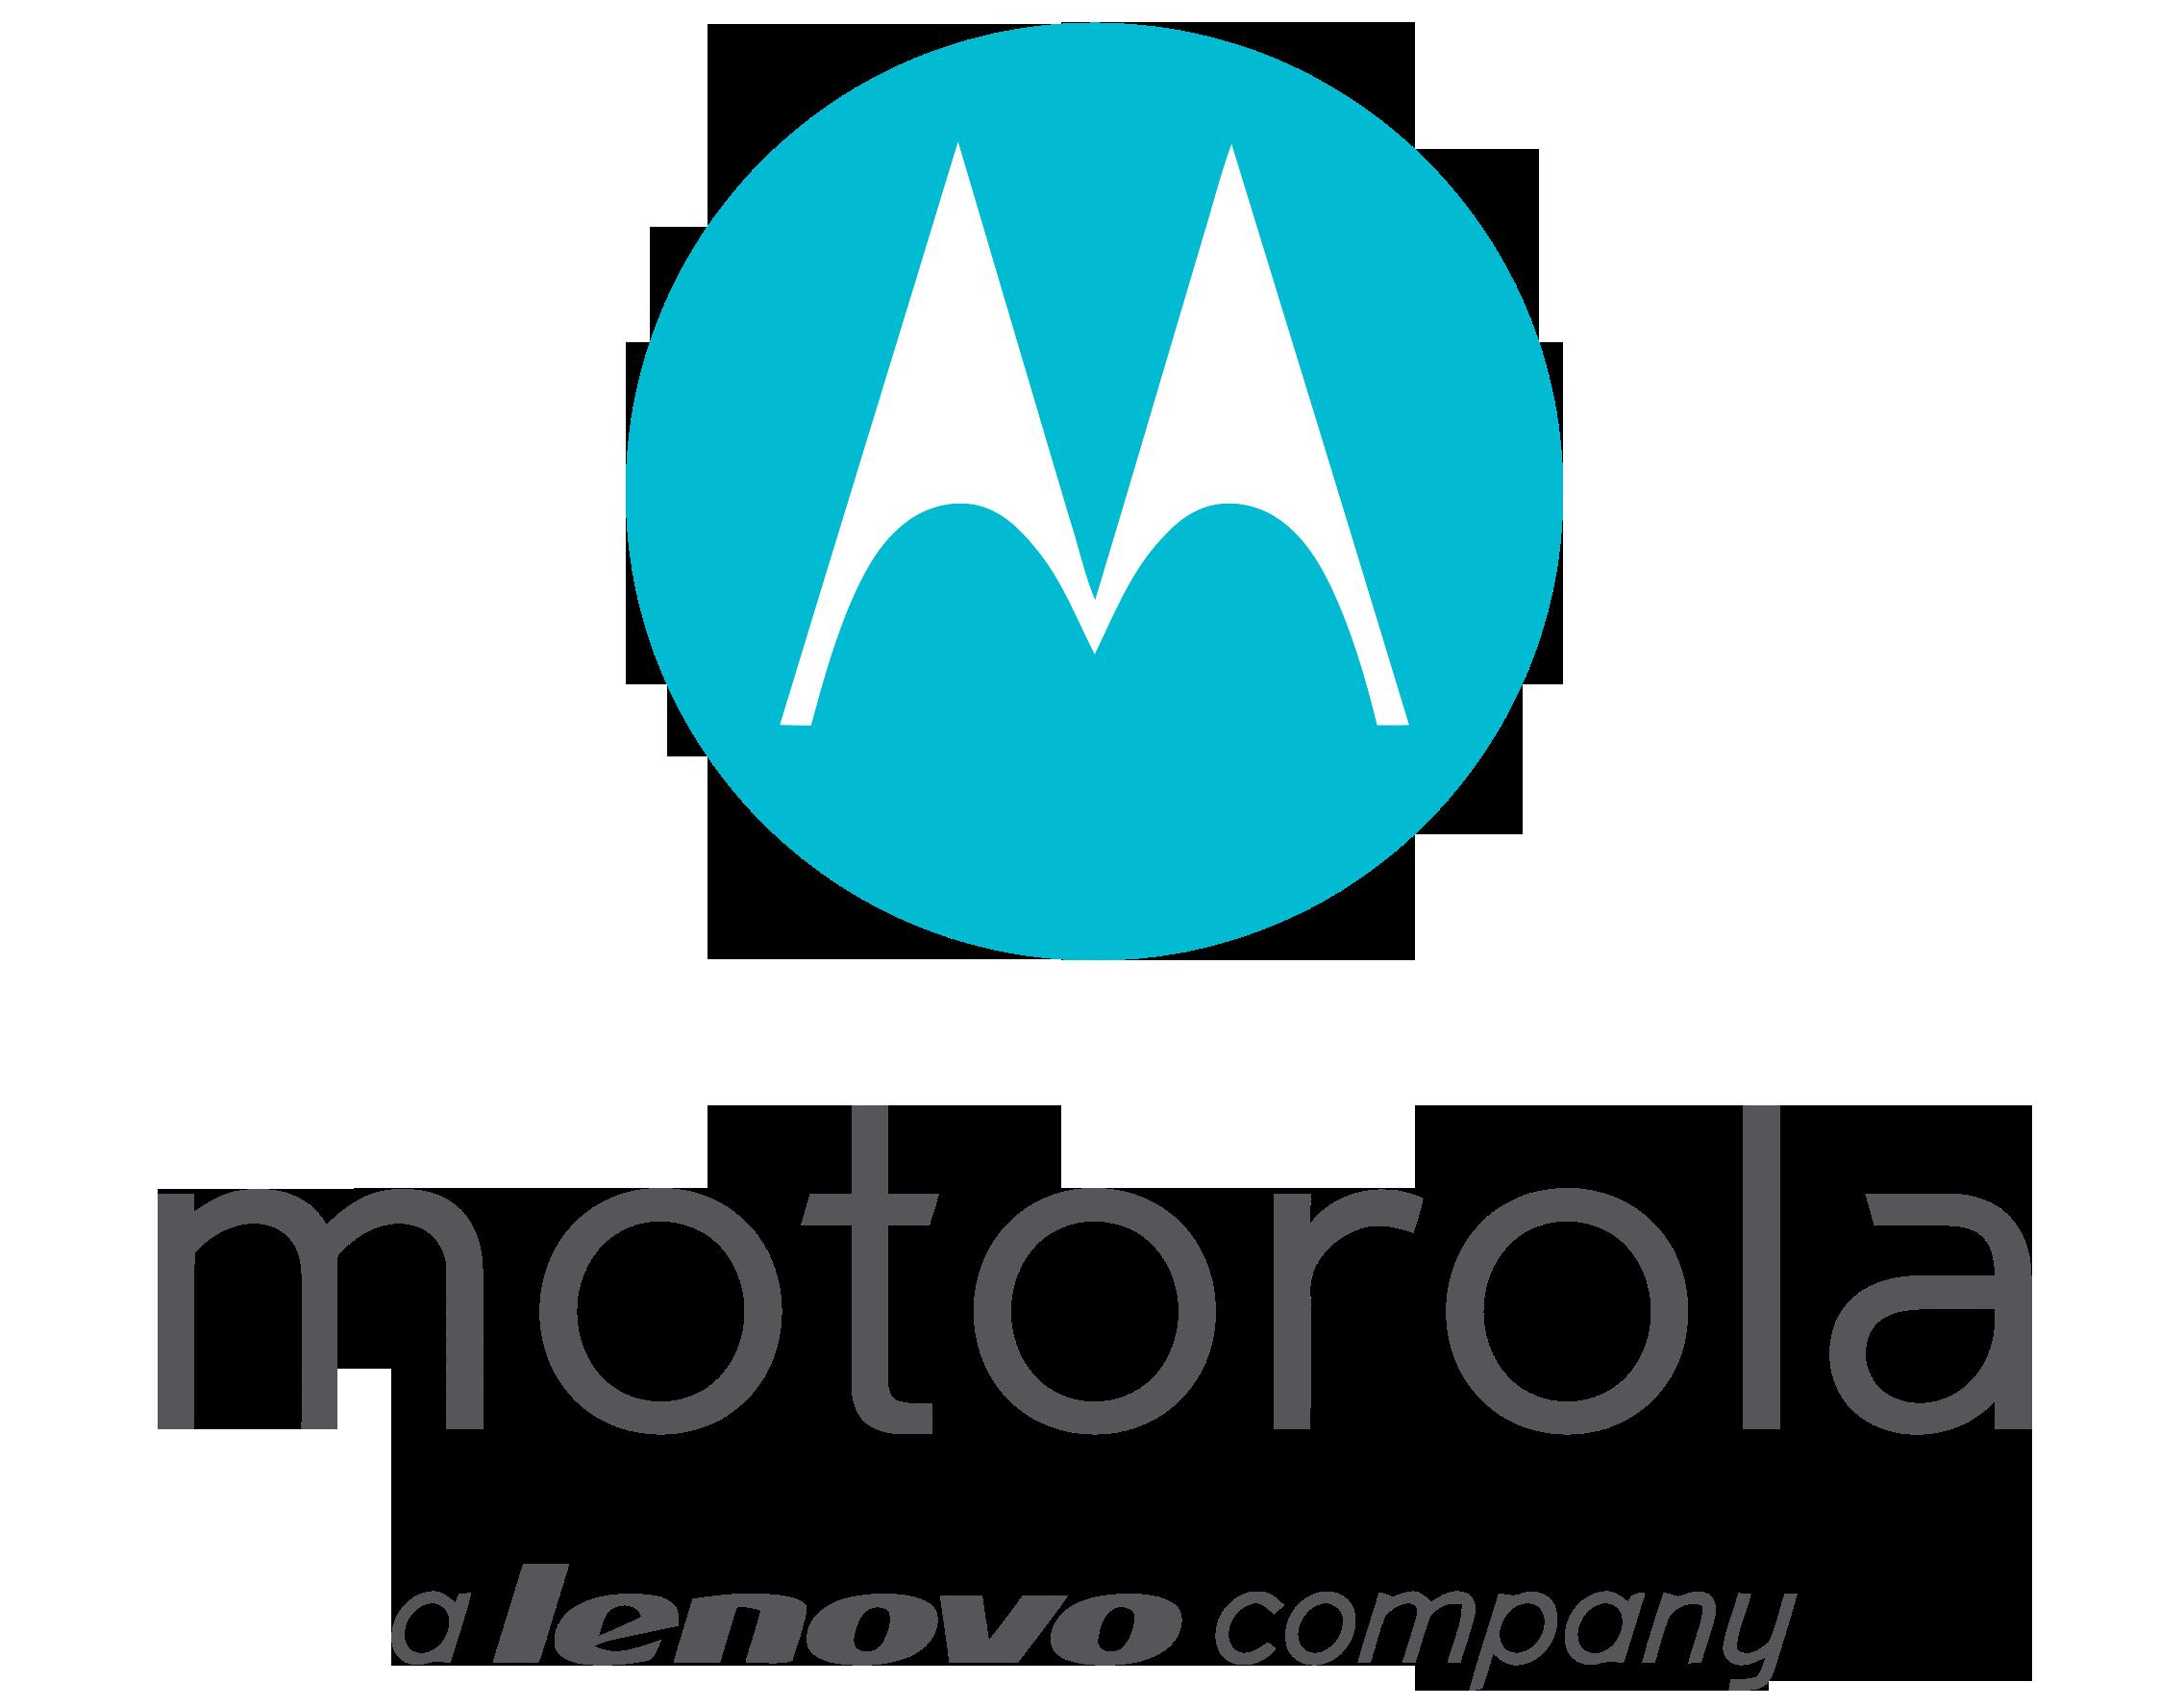 Click image for larger version  Name:Motorola_Logo-Lenovo-Company.png Views:12266 Size:152.7 KB ID:4107346